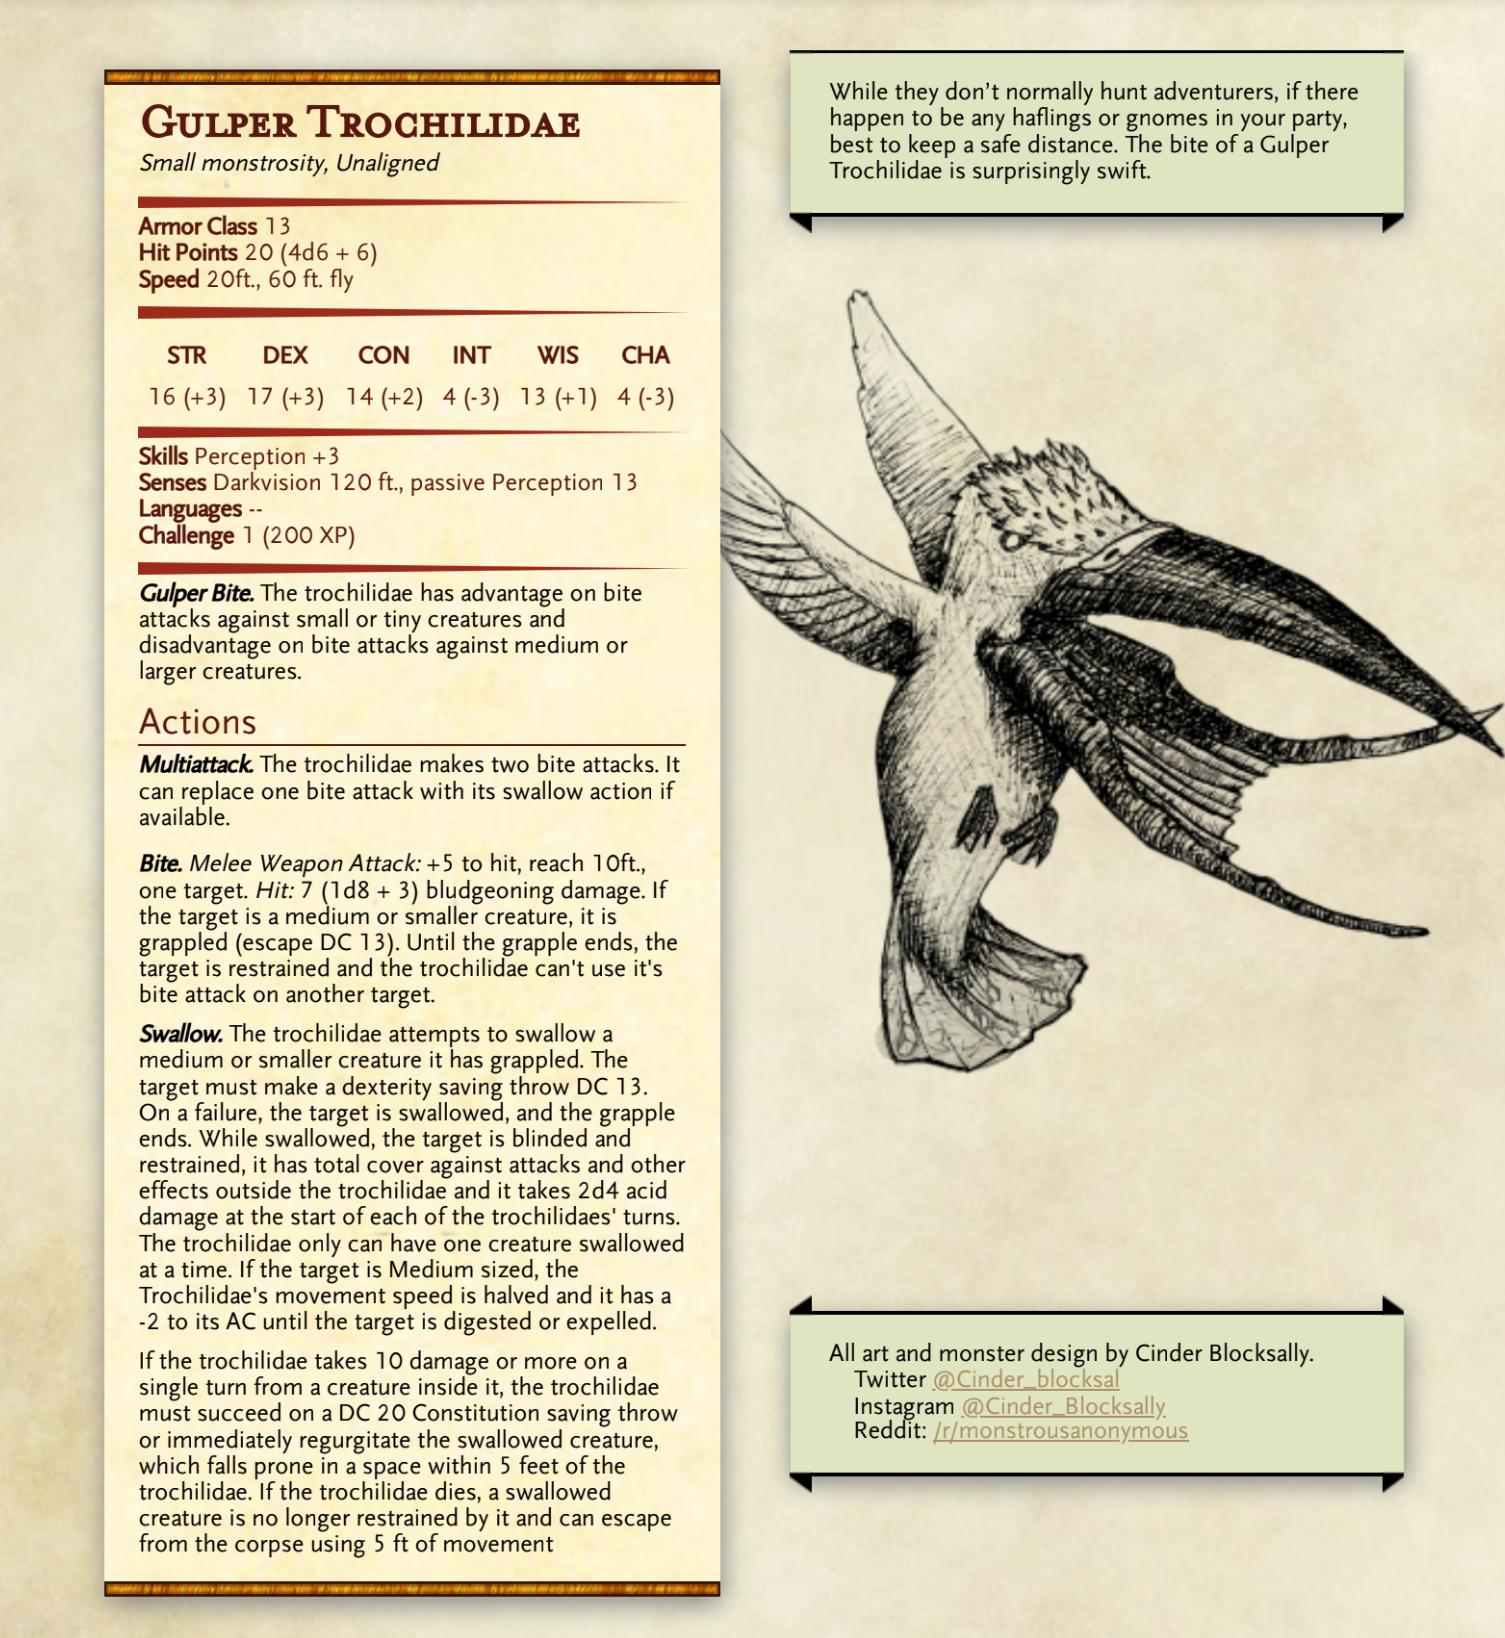 Gulper Trochilidia - A Cinder Blocksally Monster